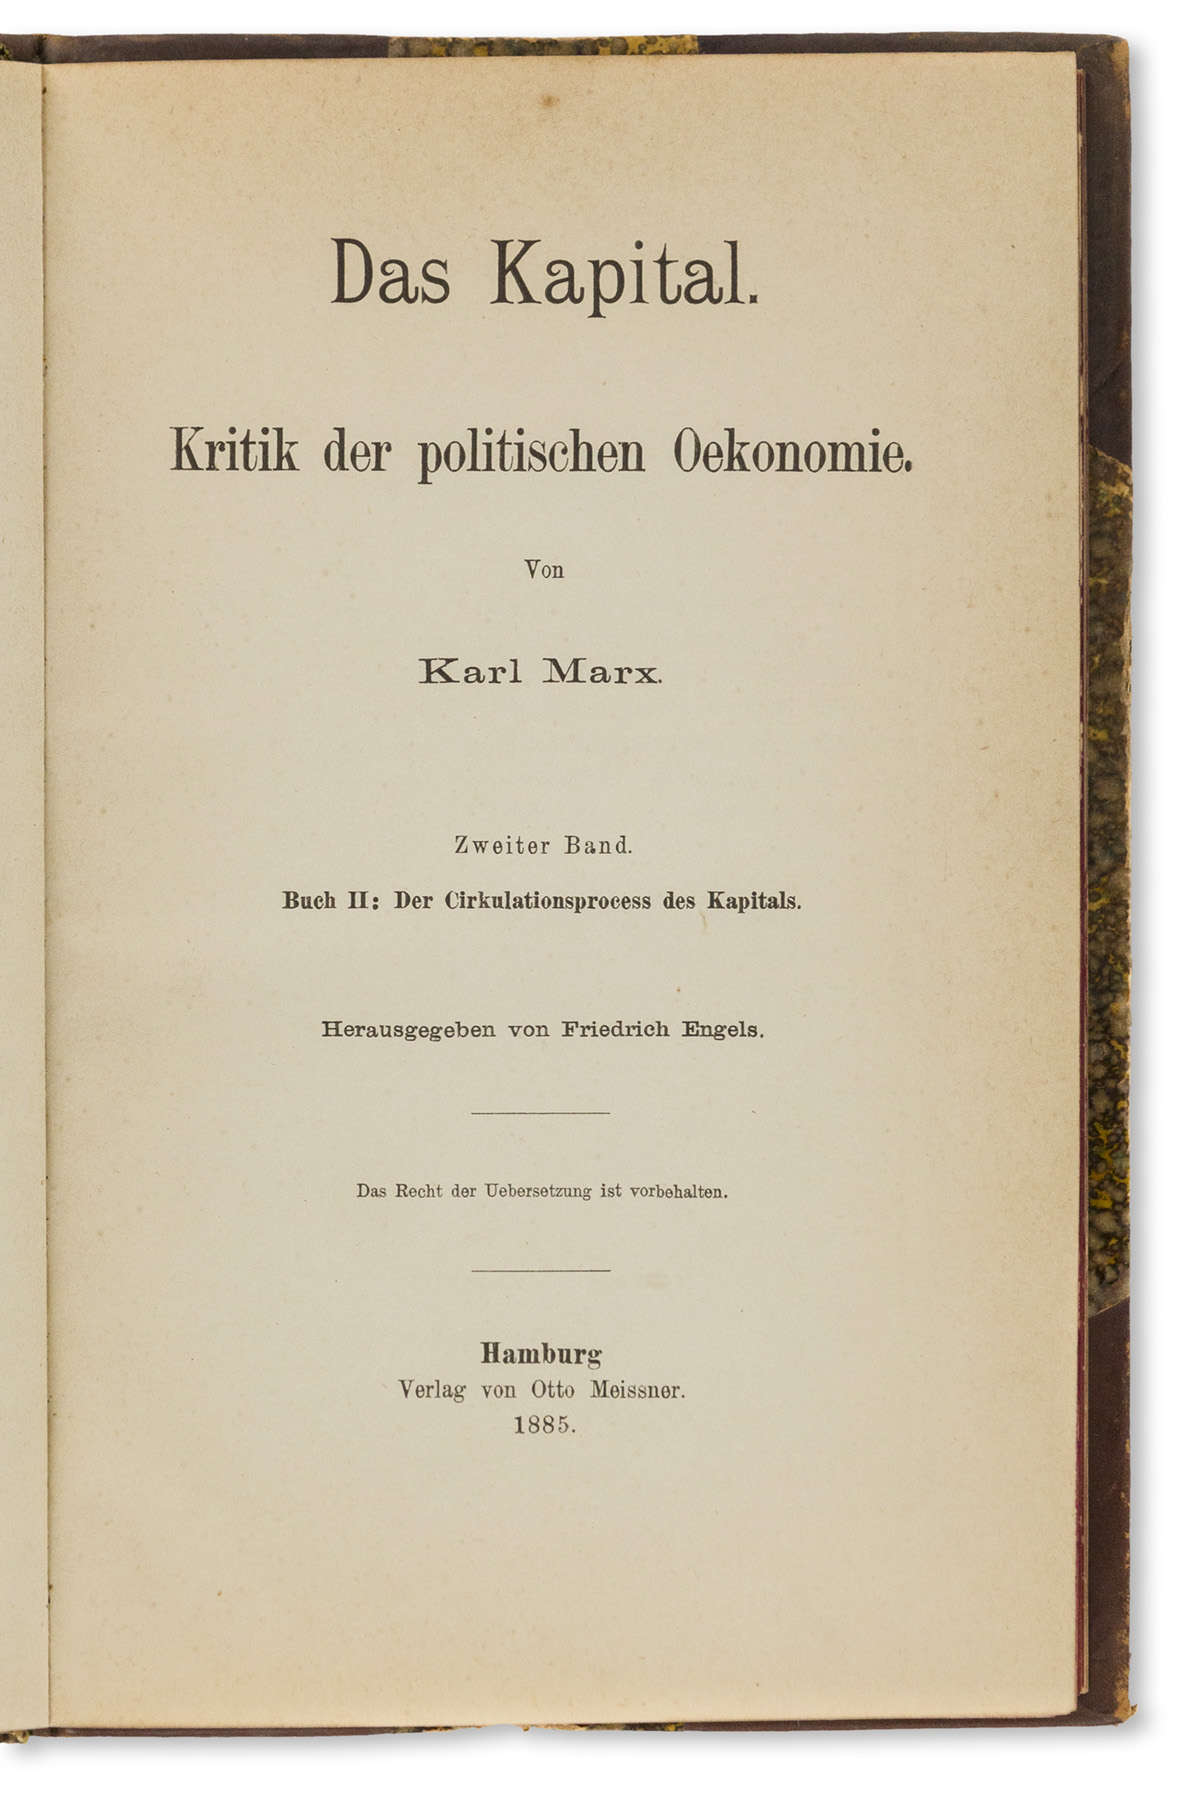 Marx, Karl (1818-1883); ed. Friedrich Engels (1820-1895) Das Kapital, Parts II & III.